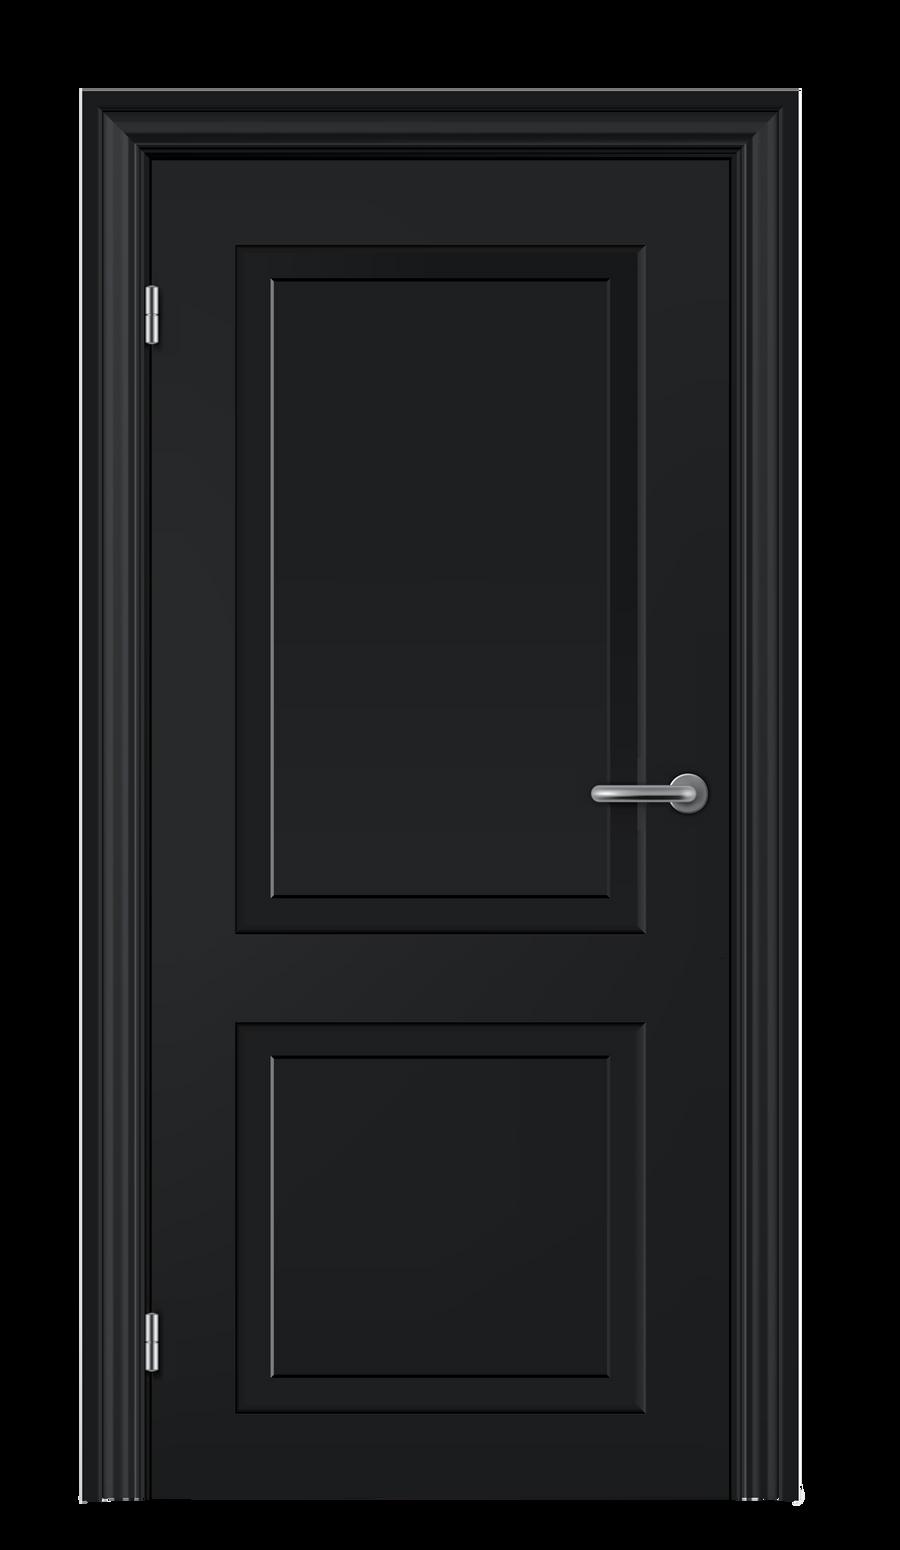 Closing Doors F : How you guys earn money online askreddit